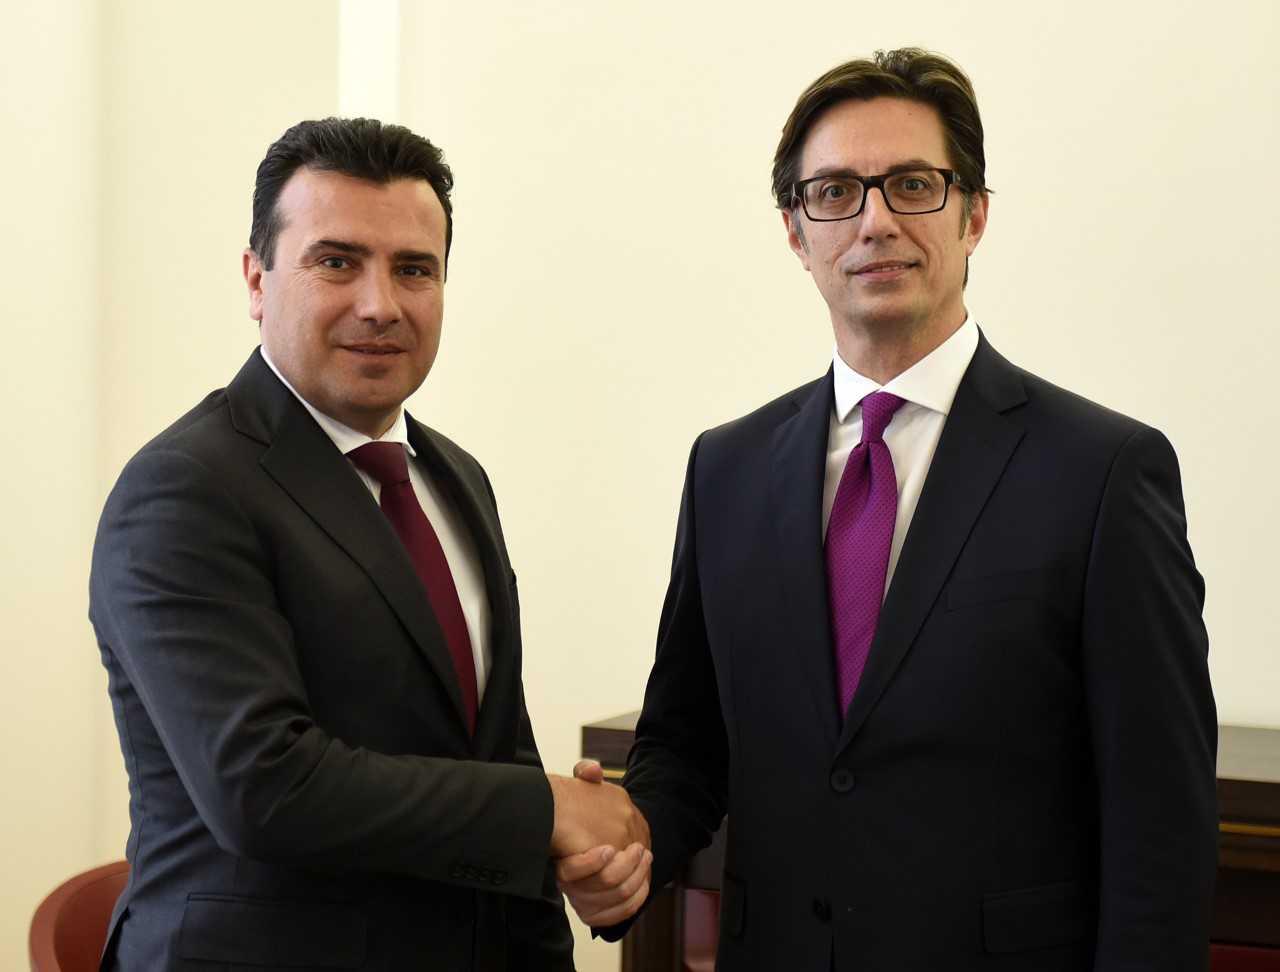 Zaev-Pendarovski χαράσσουν κοινή ατζέντα εξωτερικής πολιτικής